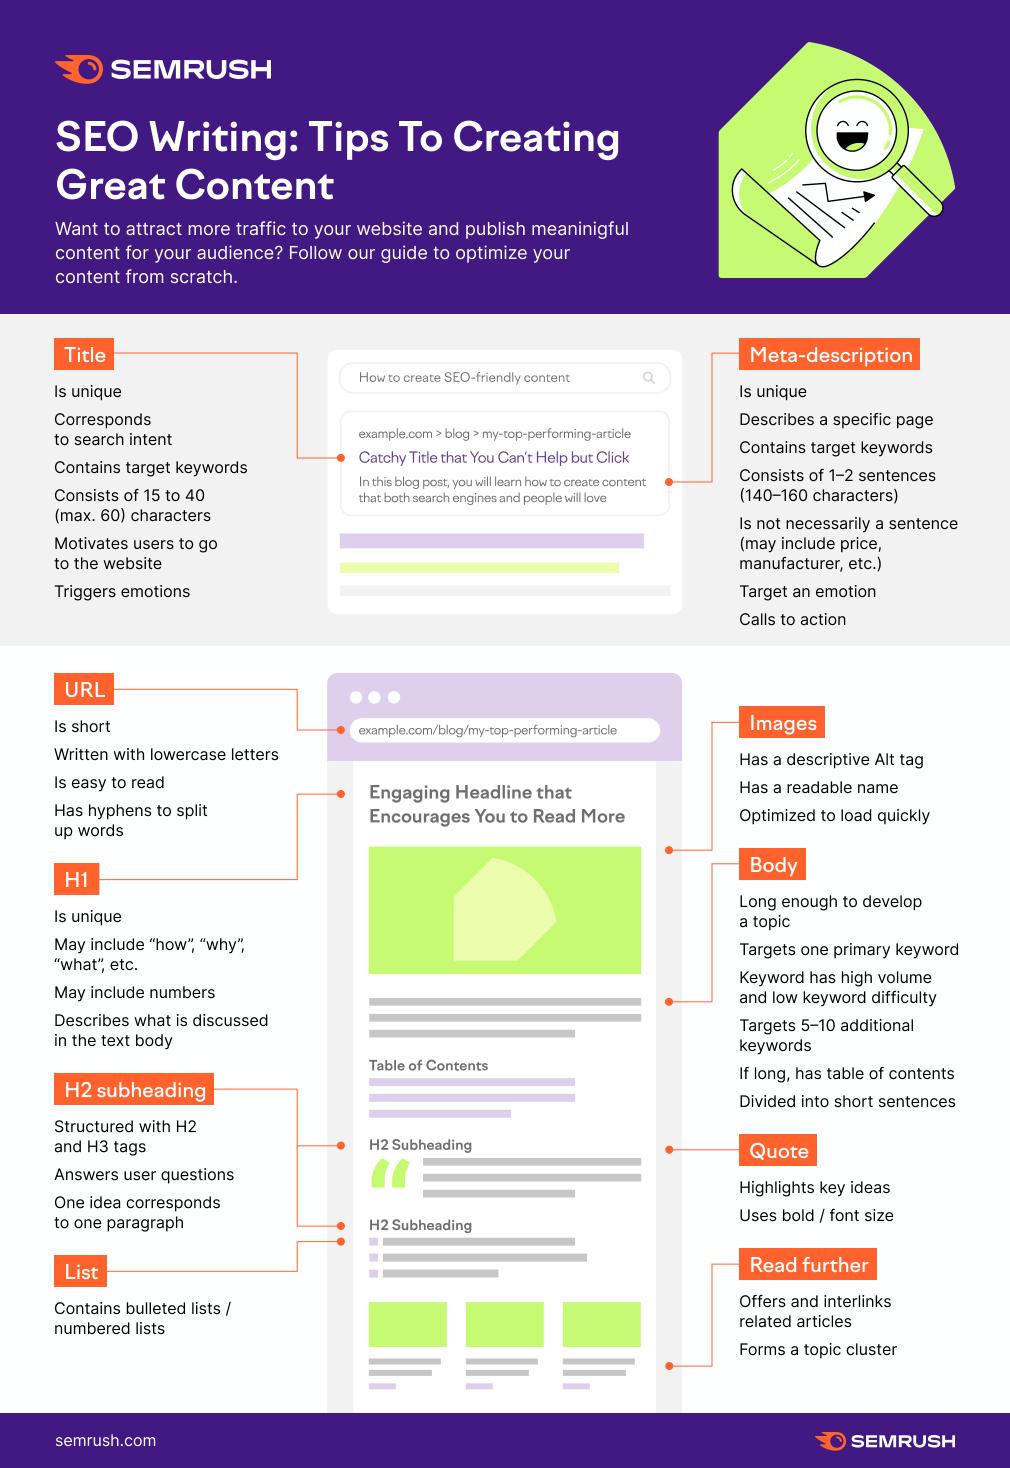 seo writing tips infographic